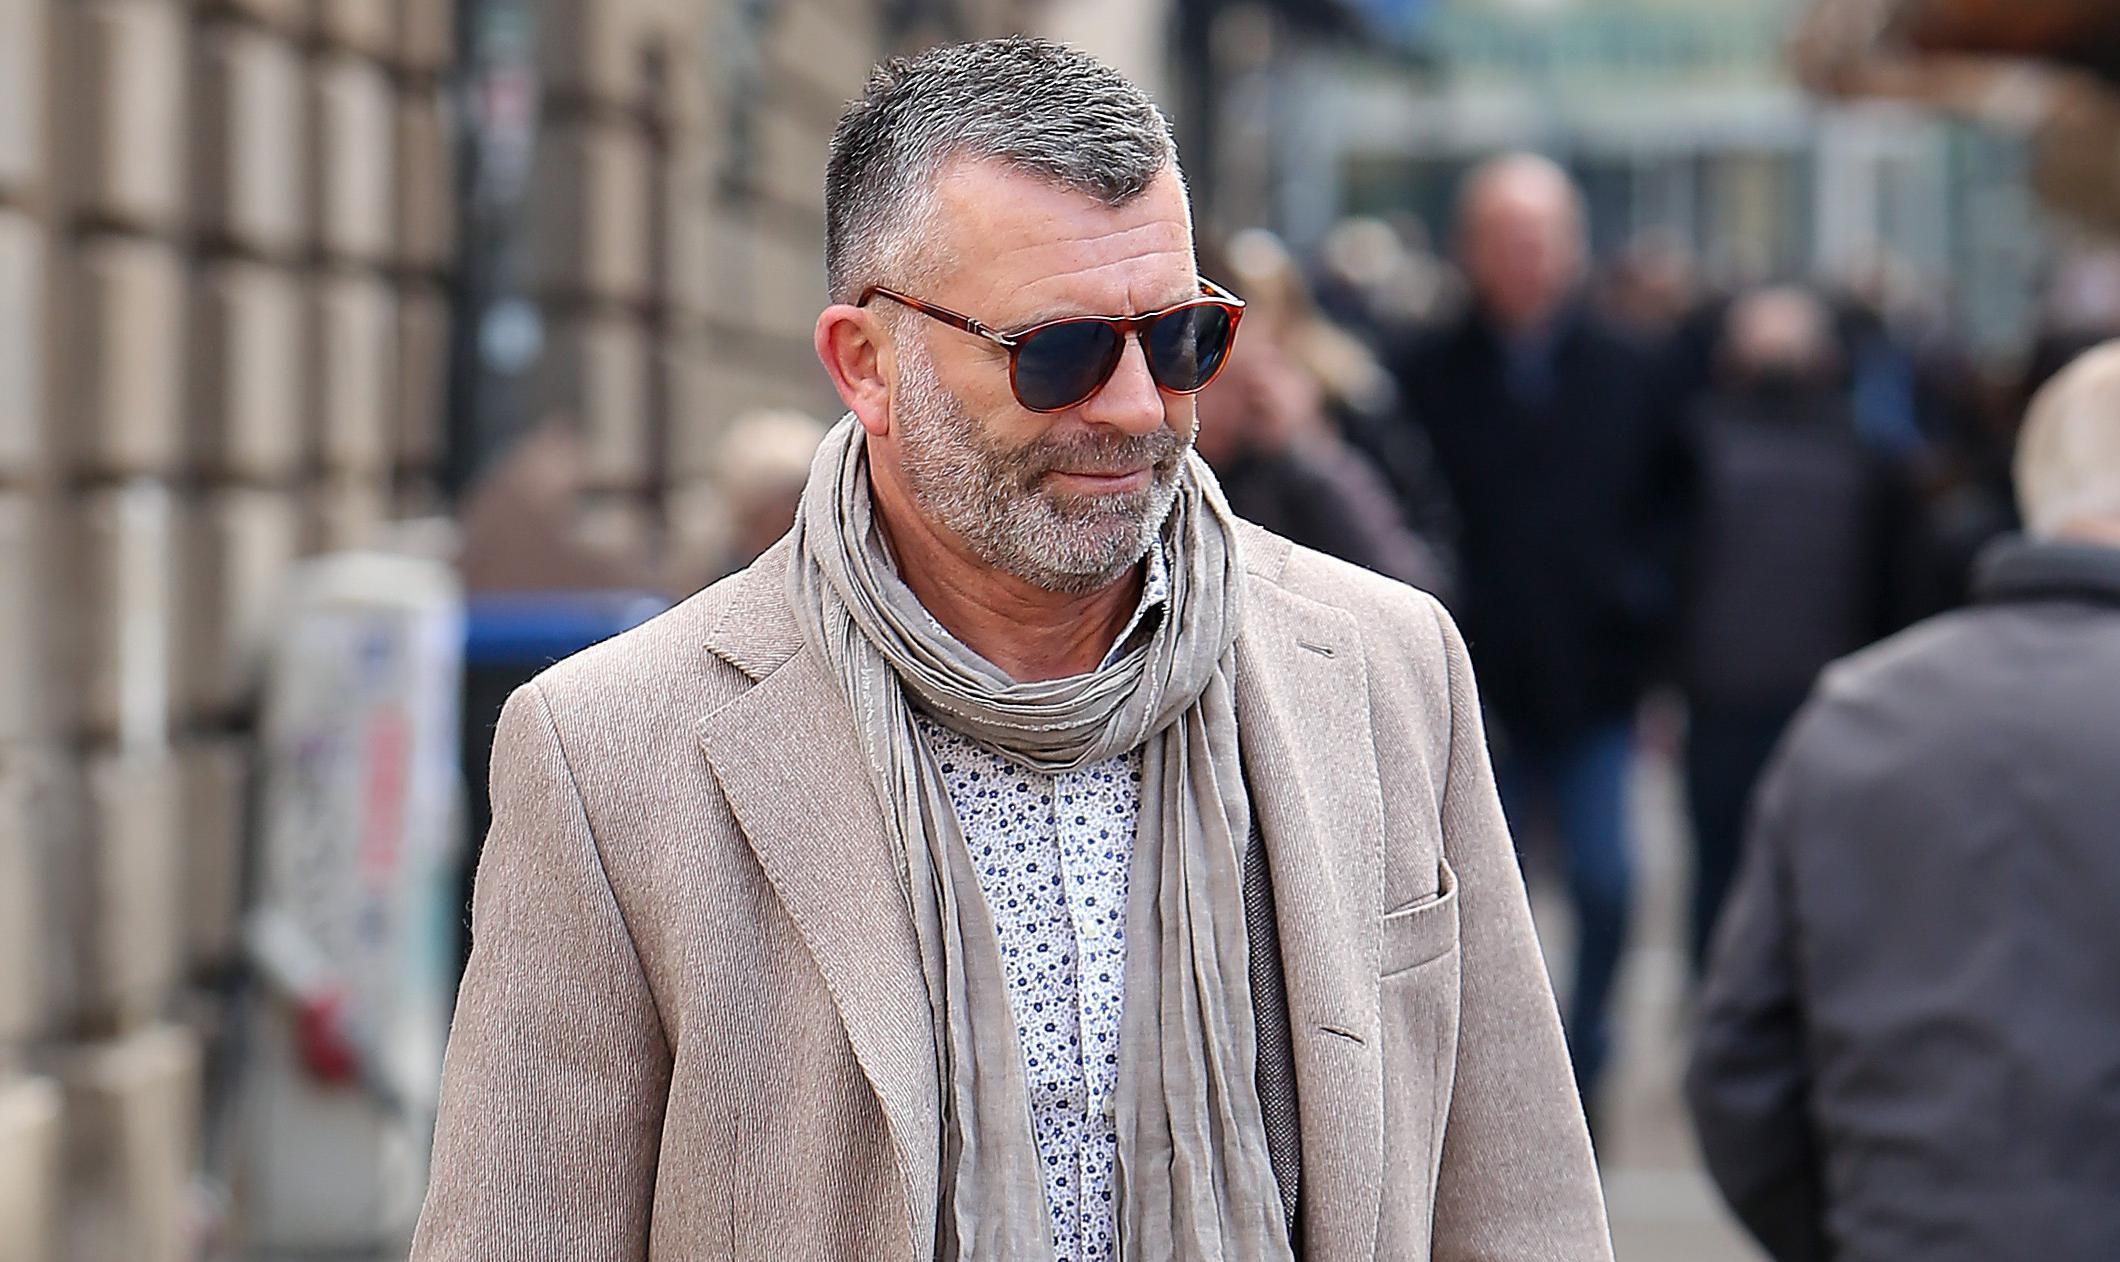 Košulja s uzorkom, šal, cool naočale... Gospodin sa špice zna kako biti stylish u par poteza!